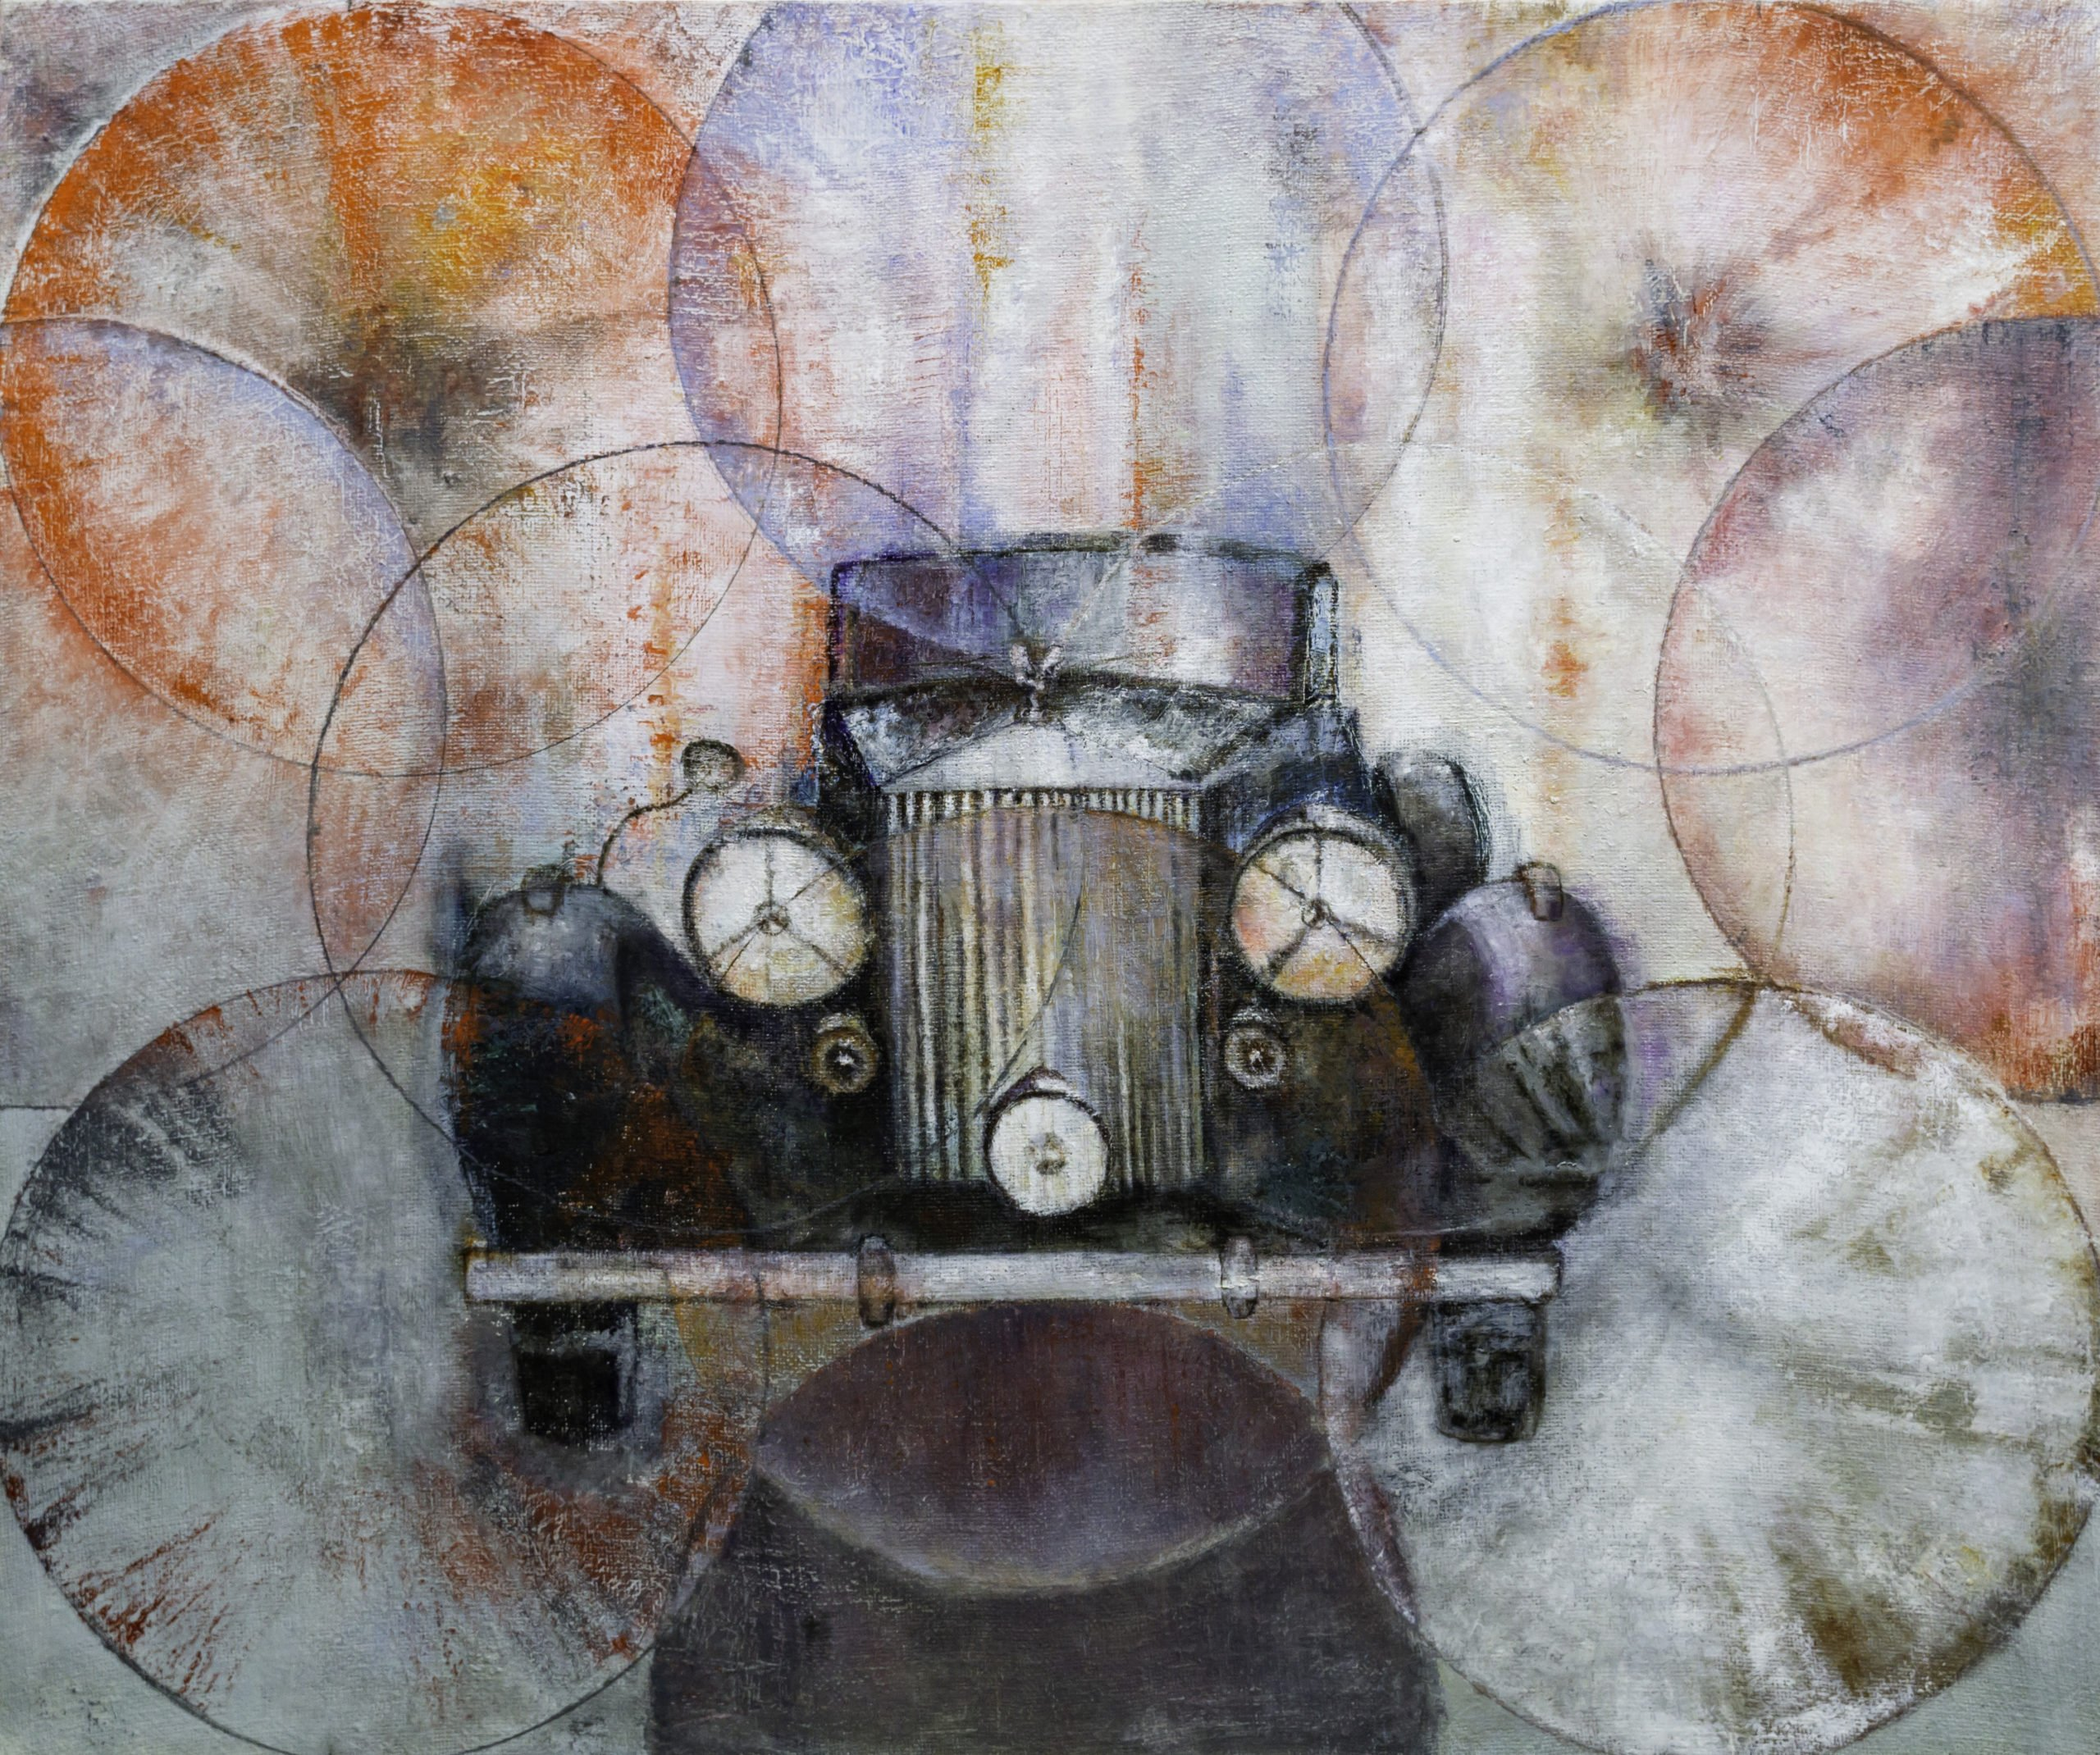 Joanna Zylla | Charleston | Öl auf Leinwand | 100 x 120 cm | 2019